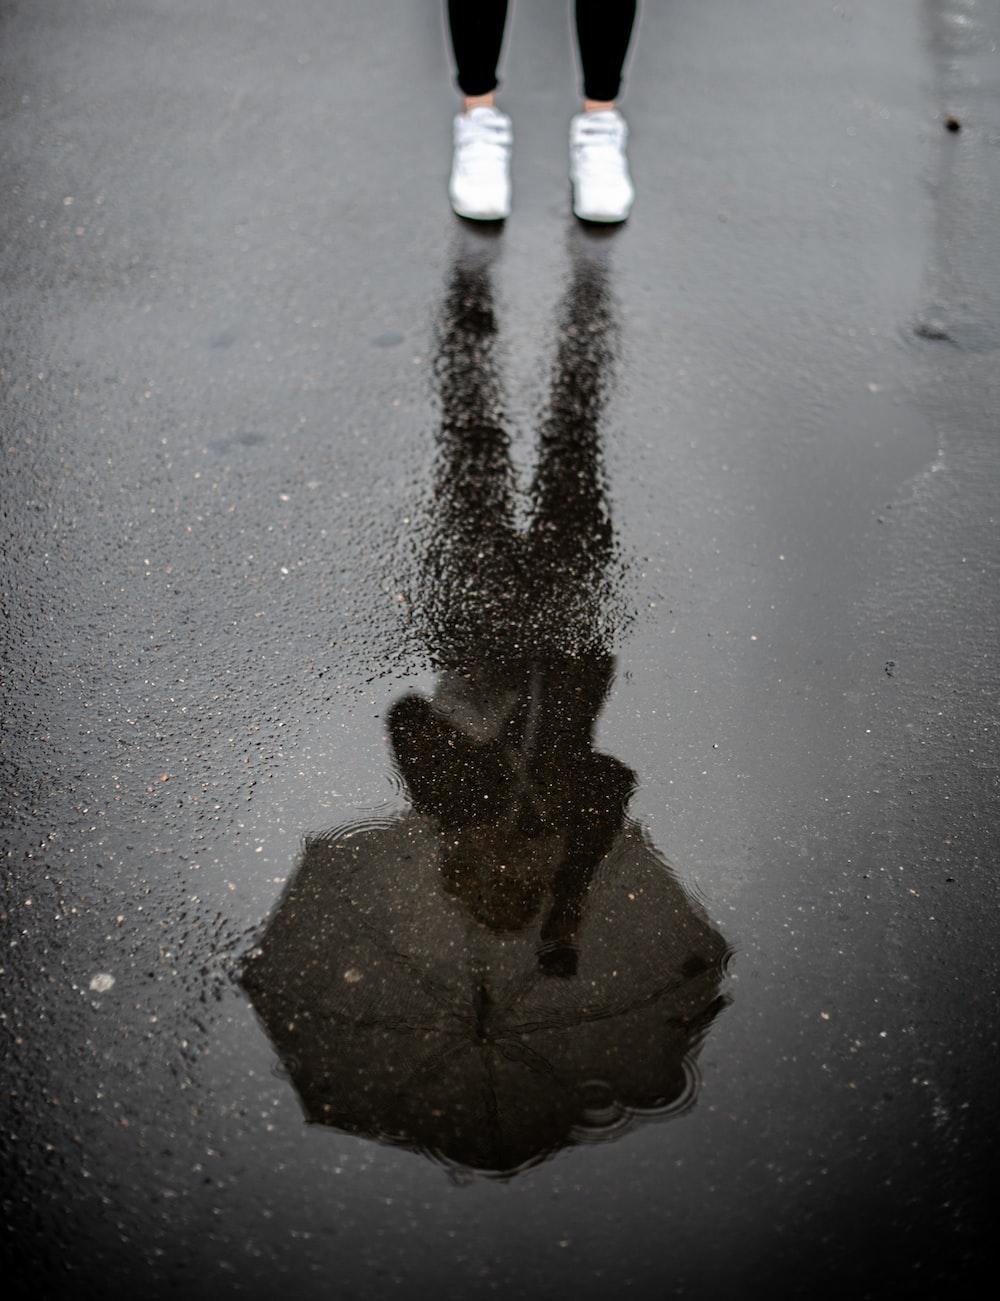 person holding umbrella